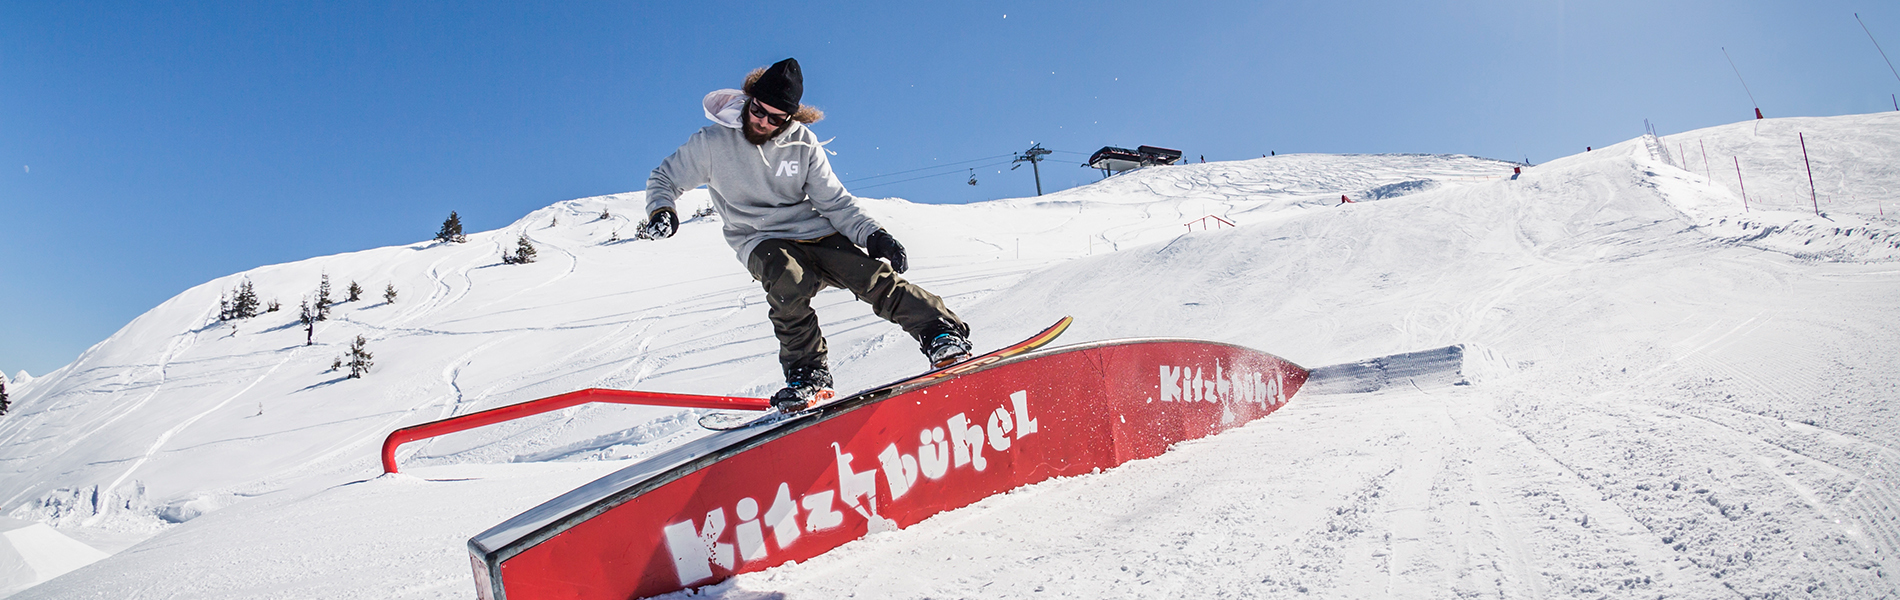 Kicker & Rail Check im Snowpark Kitzbühel